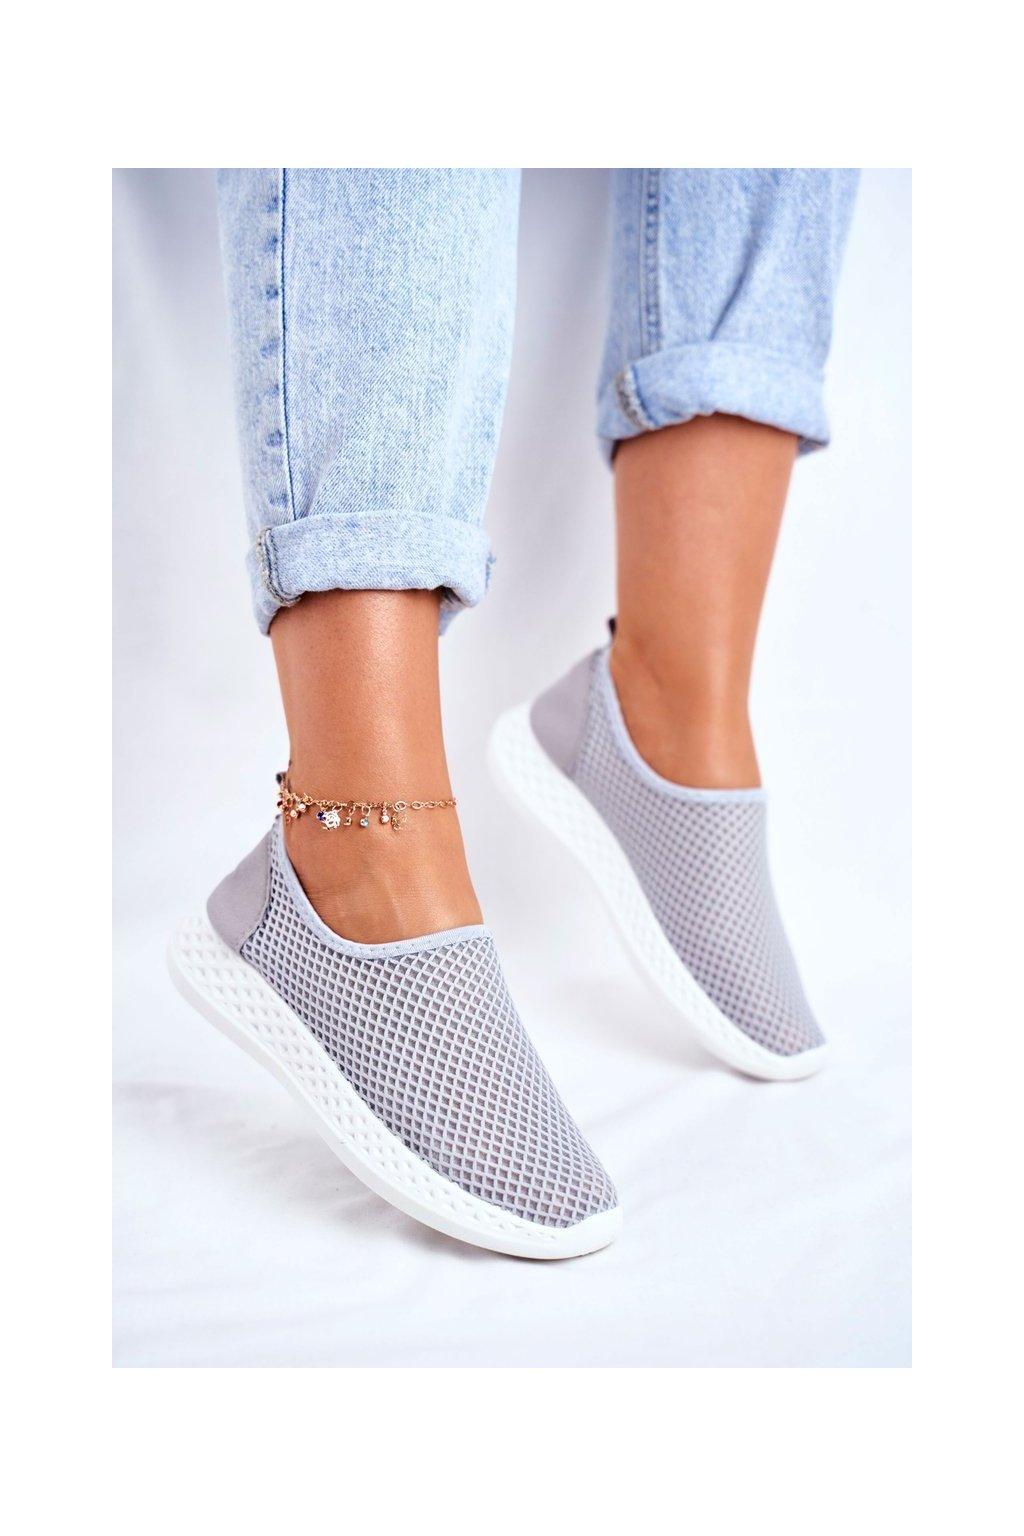 Dámska športová obuv Slip-on sivé Gestacio